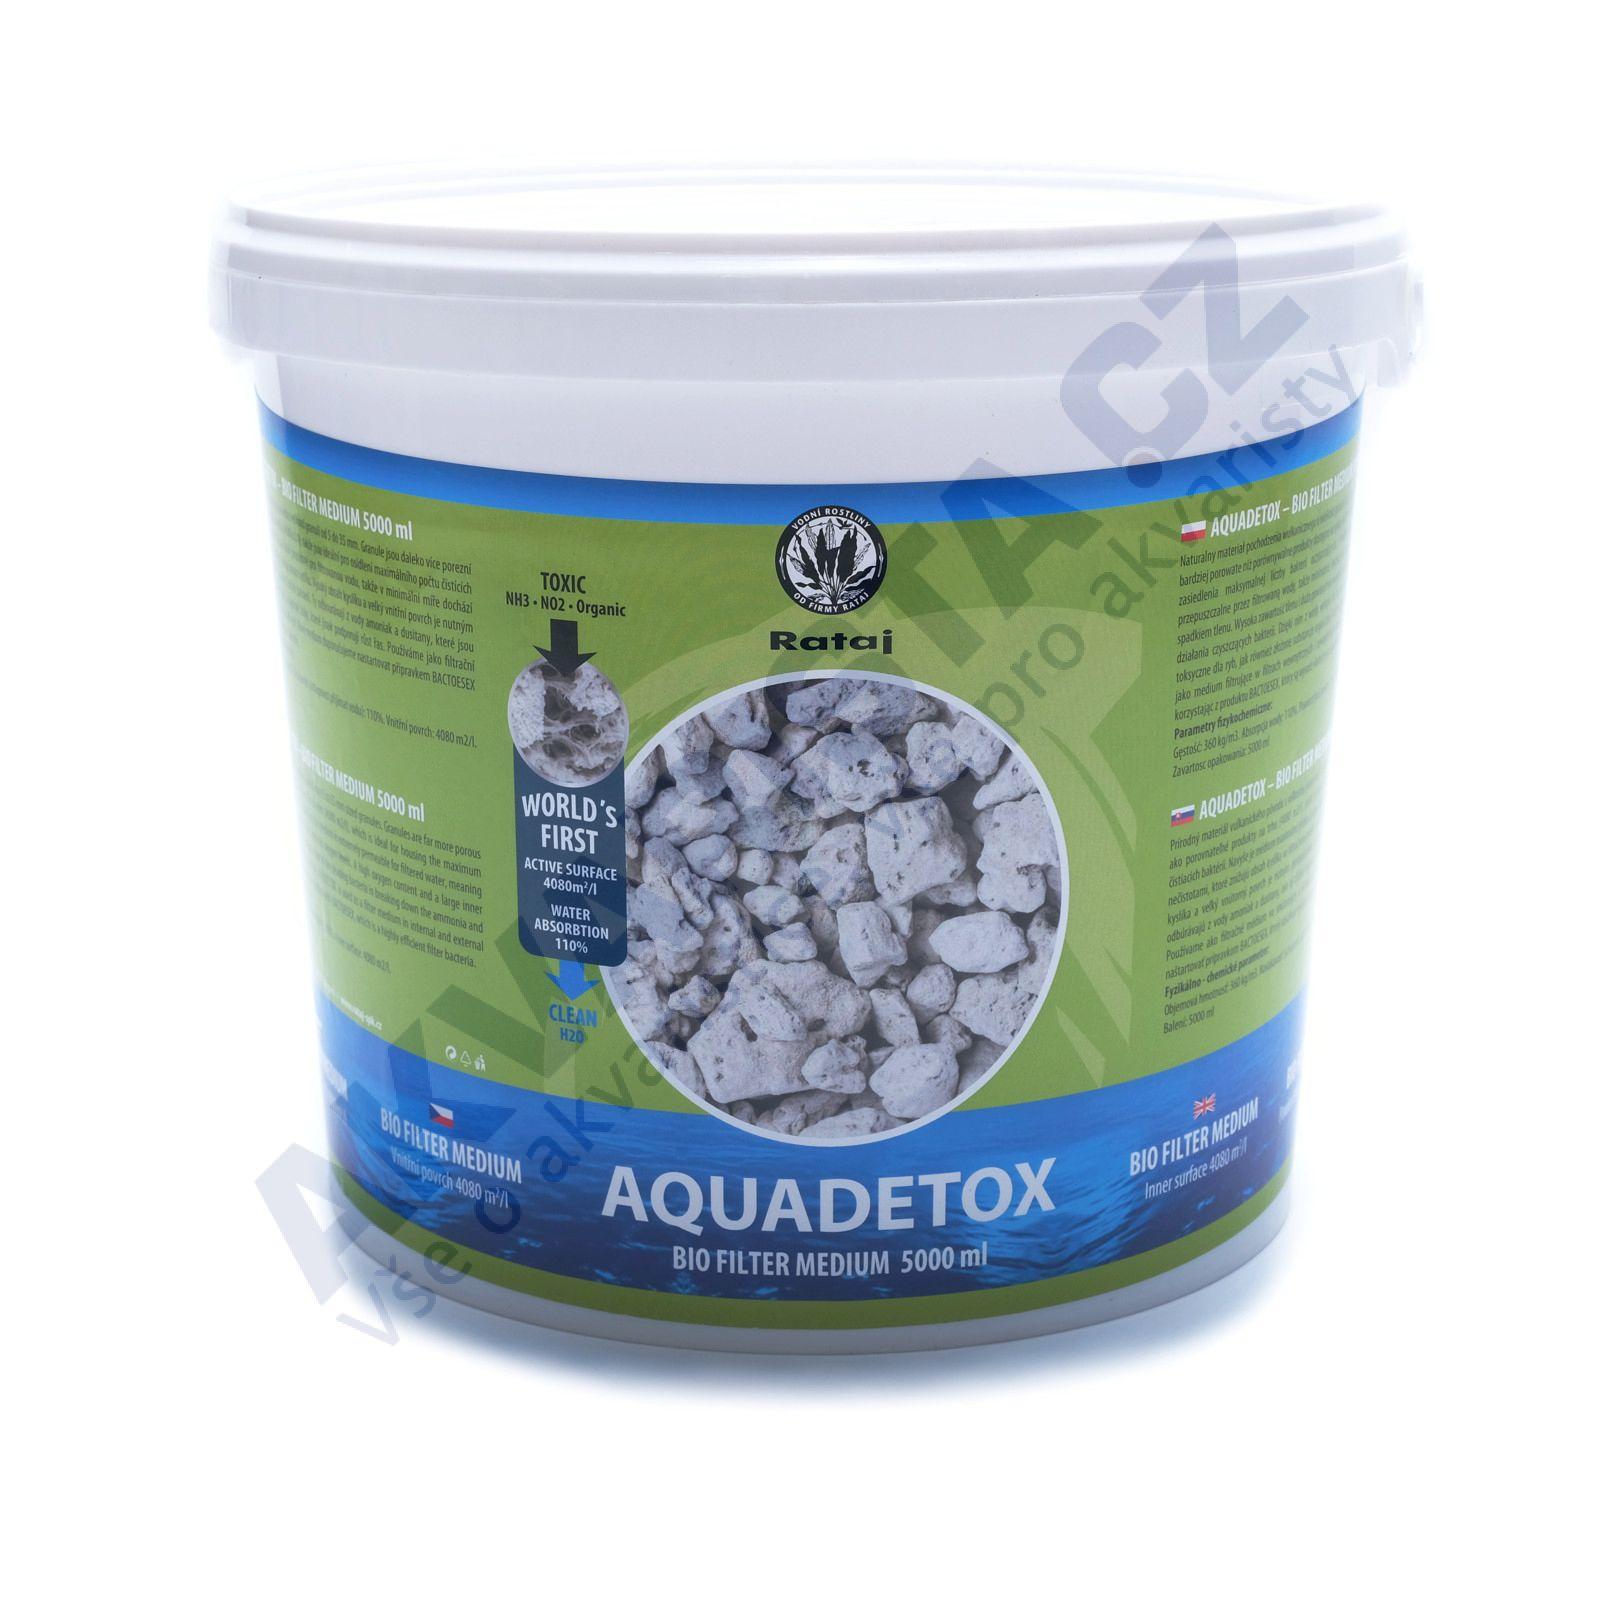 Rataj Aquadetox 3000 ml